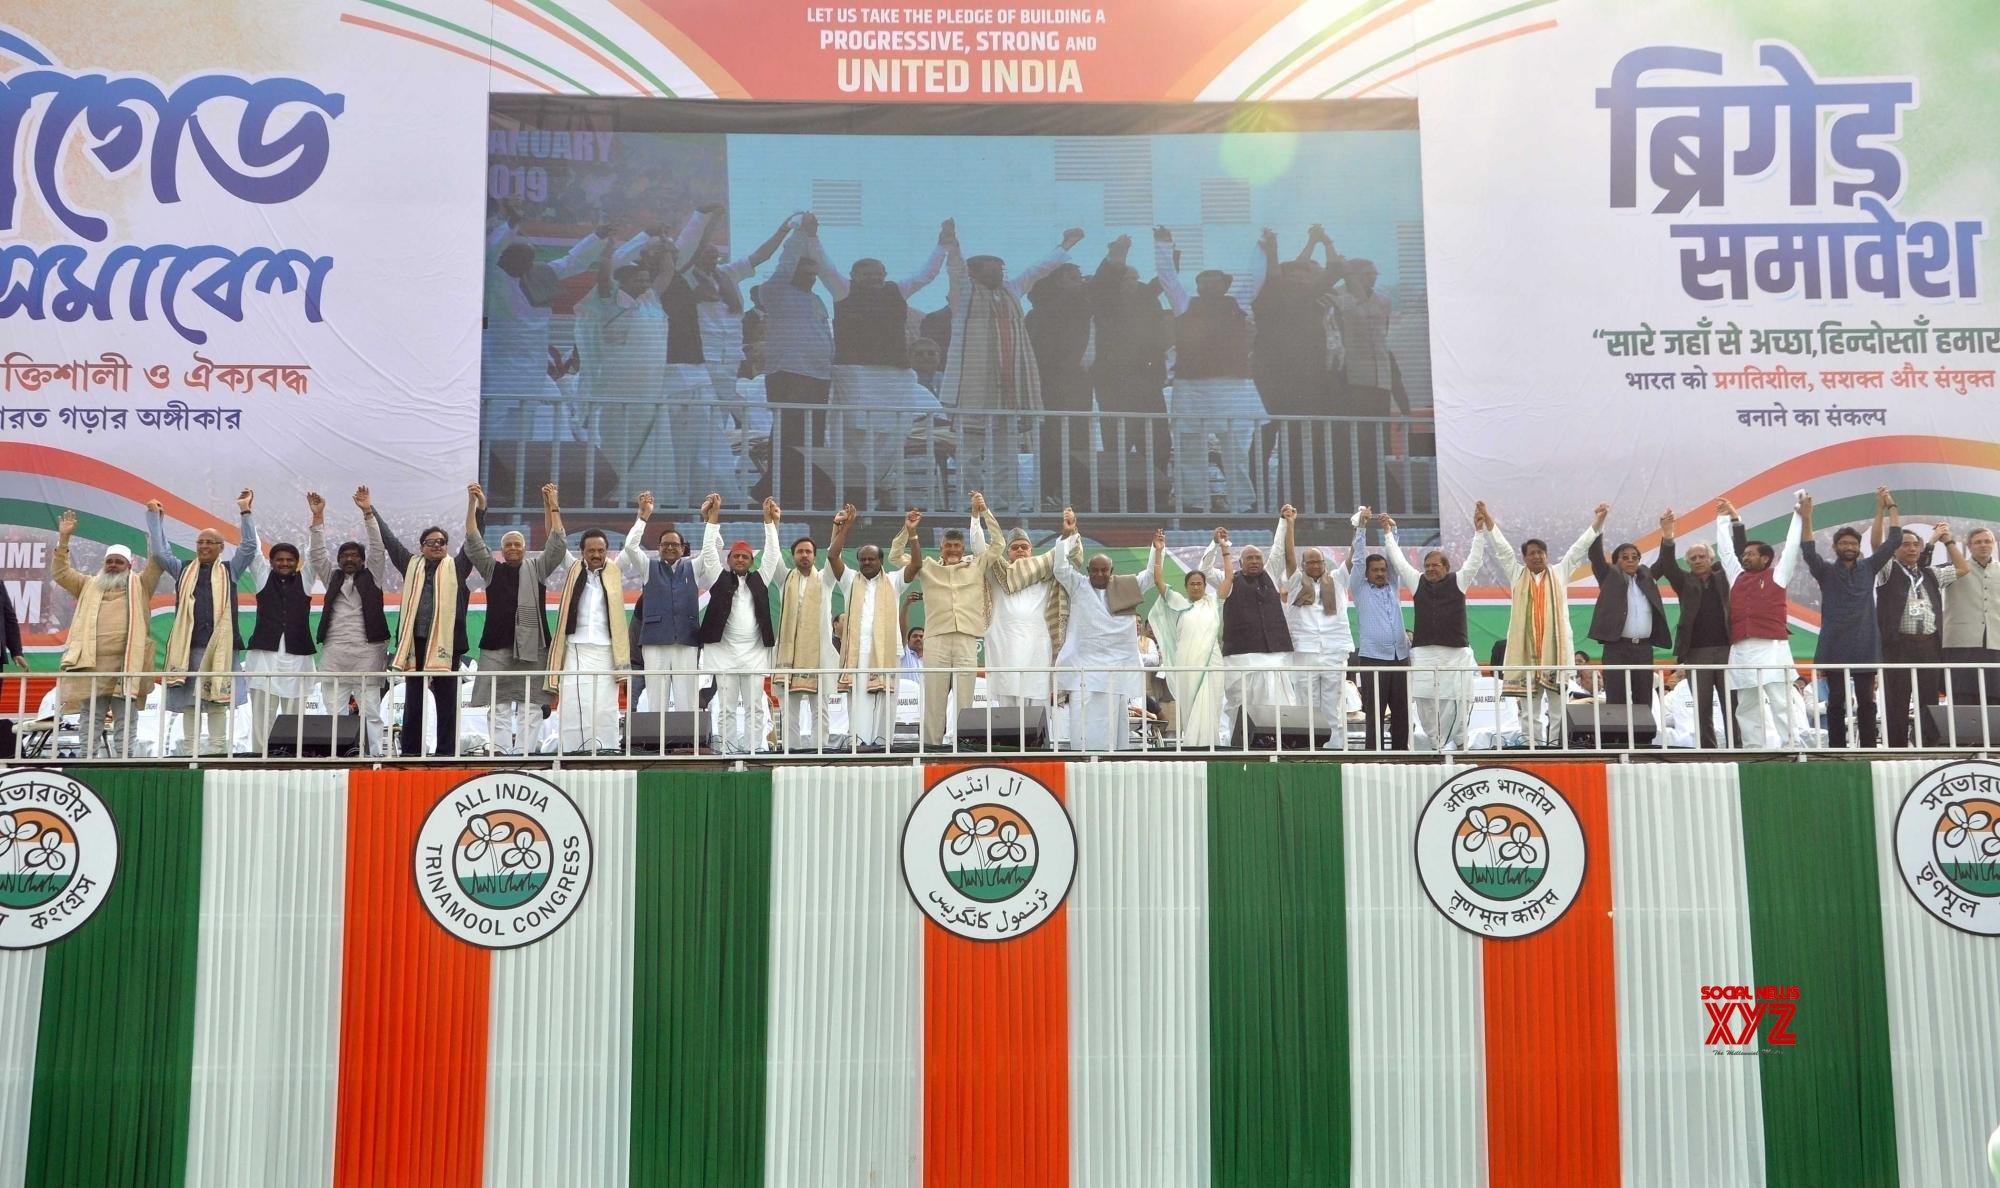 Kolkata: TMC supremo Mamata Banerjee with AIMIM leader Badruddin Ajmal, Congress leader Abhishek Manu Singhvi, Gujarat Patidar reservation leader Hardik Patel, Jharkhand Mukti Morcha leader Hemant Soren, actor-turned-politician Shatrughan Sinha, Former Union Minister Yashwant Sinha, DMK President MK Stalin, BSP leader Satish Mishra, Samajwadi Party President Akhilesh Yadav, Rashtriya Lok Dal leader Jayant Chaudhary, Karnataka Chief Minister and JD-S leader H.D. Kumaraswamy, Andhra Pradesh Chief Minister and TDP leader N. Chandrababu Naidu, National Conference President Farooq Abdullah, JD-S President H.D. Deve Gowda, Congress leader Mallikarjun Kharge, NCP President Sharad Pawar, Delhi Chief Minister and AAP chief Arvind Kejriwal, Loktantrik Janata Dal leader Sharad Yadav and Rashtriya Lok Dal chief Ajit Singh, Former Arunachal Pradesh Chief Minister Gegong Apang, Former Union Minister Arun Shourie, Dalit leader Jignesh Mewani, Zoram Nationalist Party leader Lalduhawma and National Conference leader Omar Abdullah during United India Rally at Brigade Parade Ground in Kolkata, on Jan 19, 2019. (Photo: Kuntal Chakrabarty/IANS)